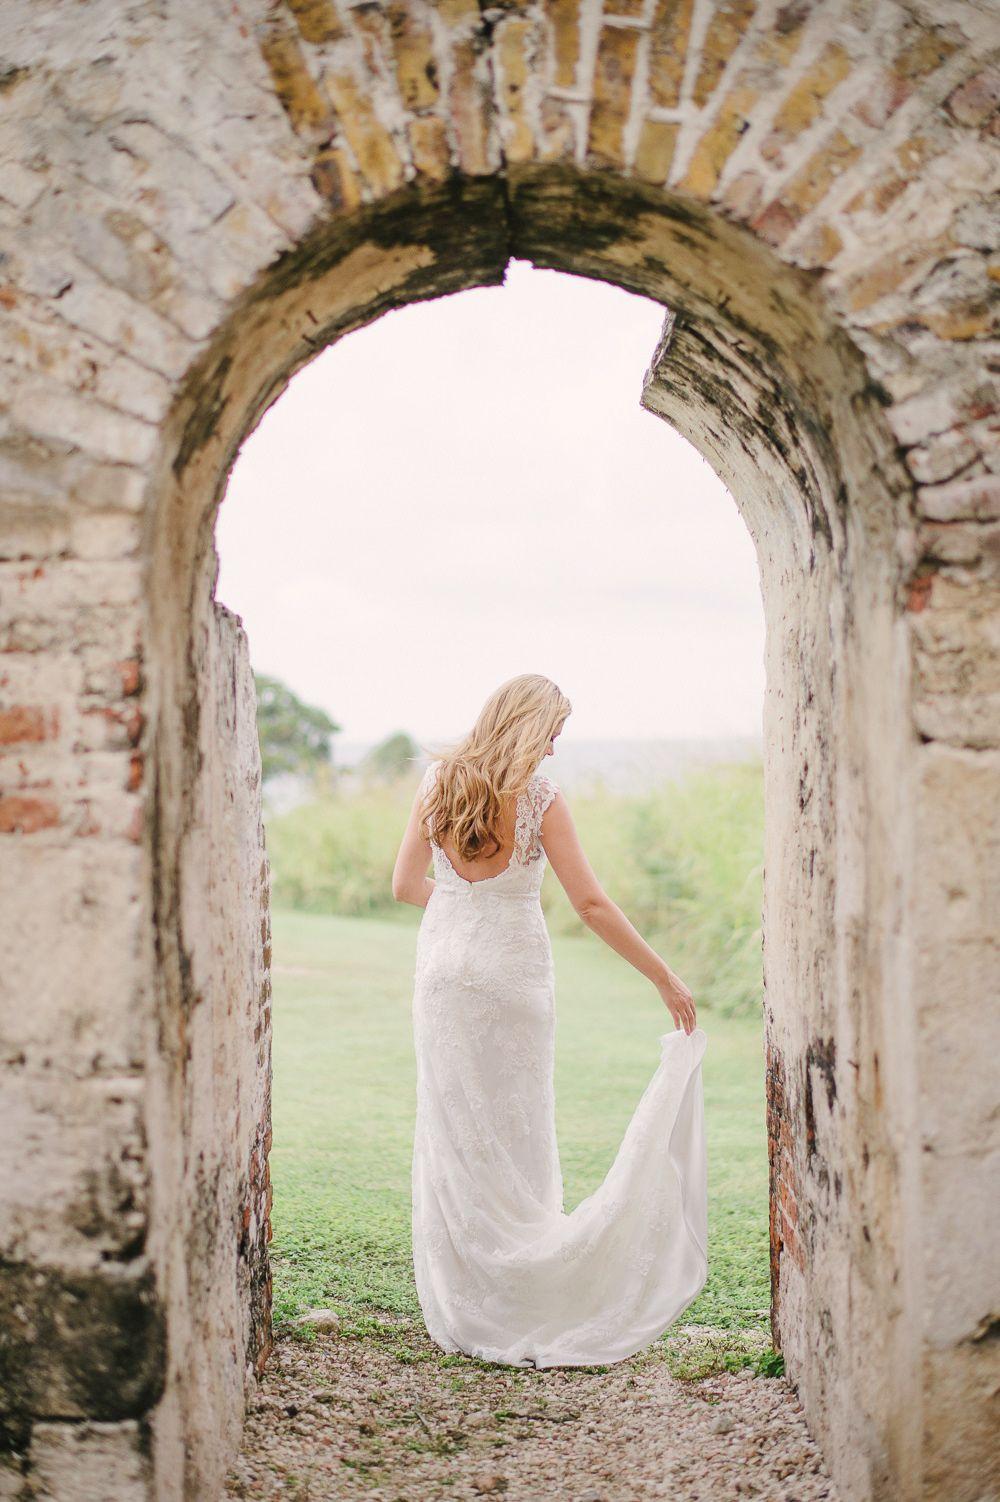 Jamaica Destination Wedding in an Ancient Aqueduct